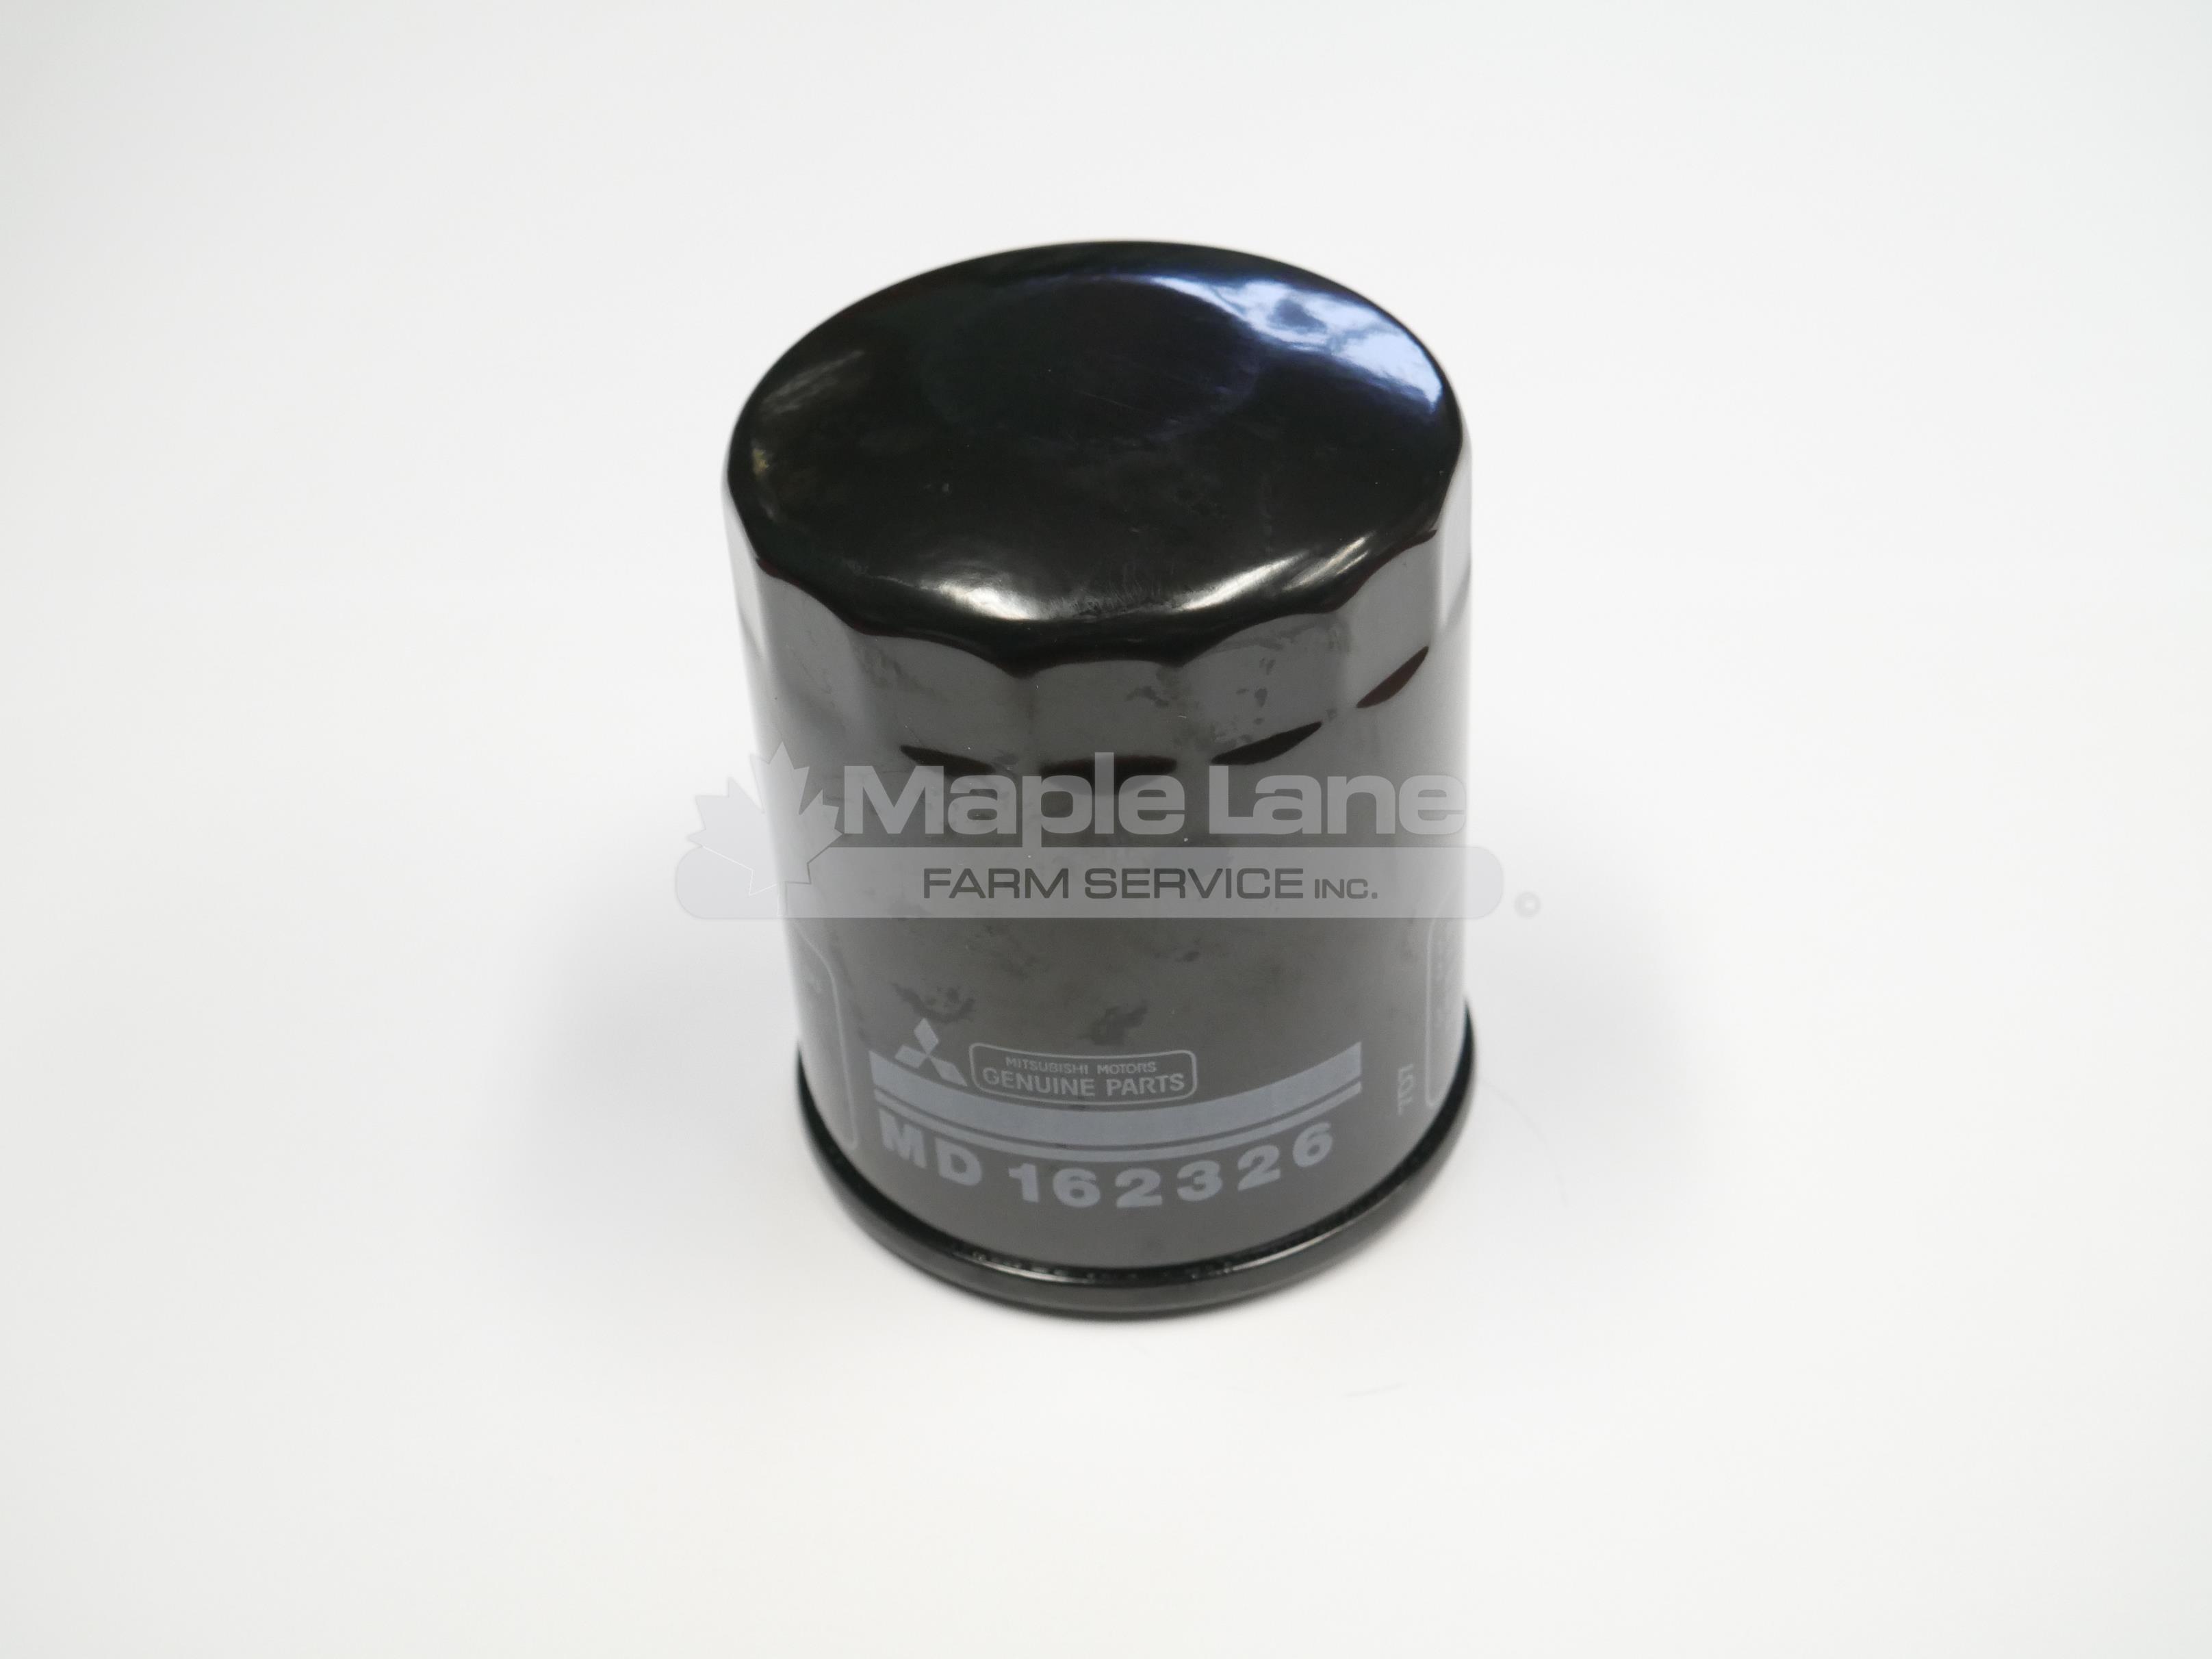 7064196m91 filter element